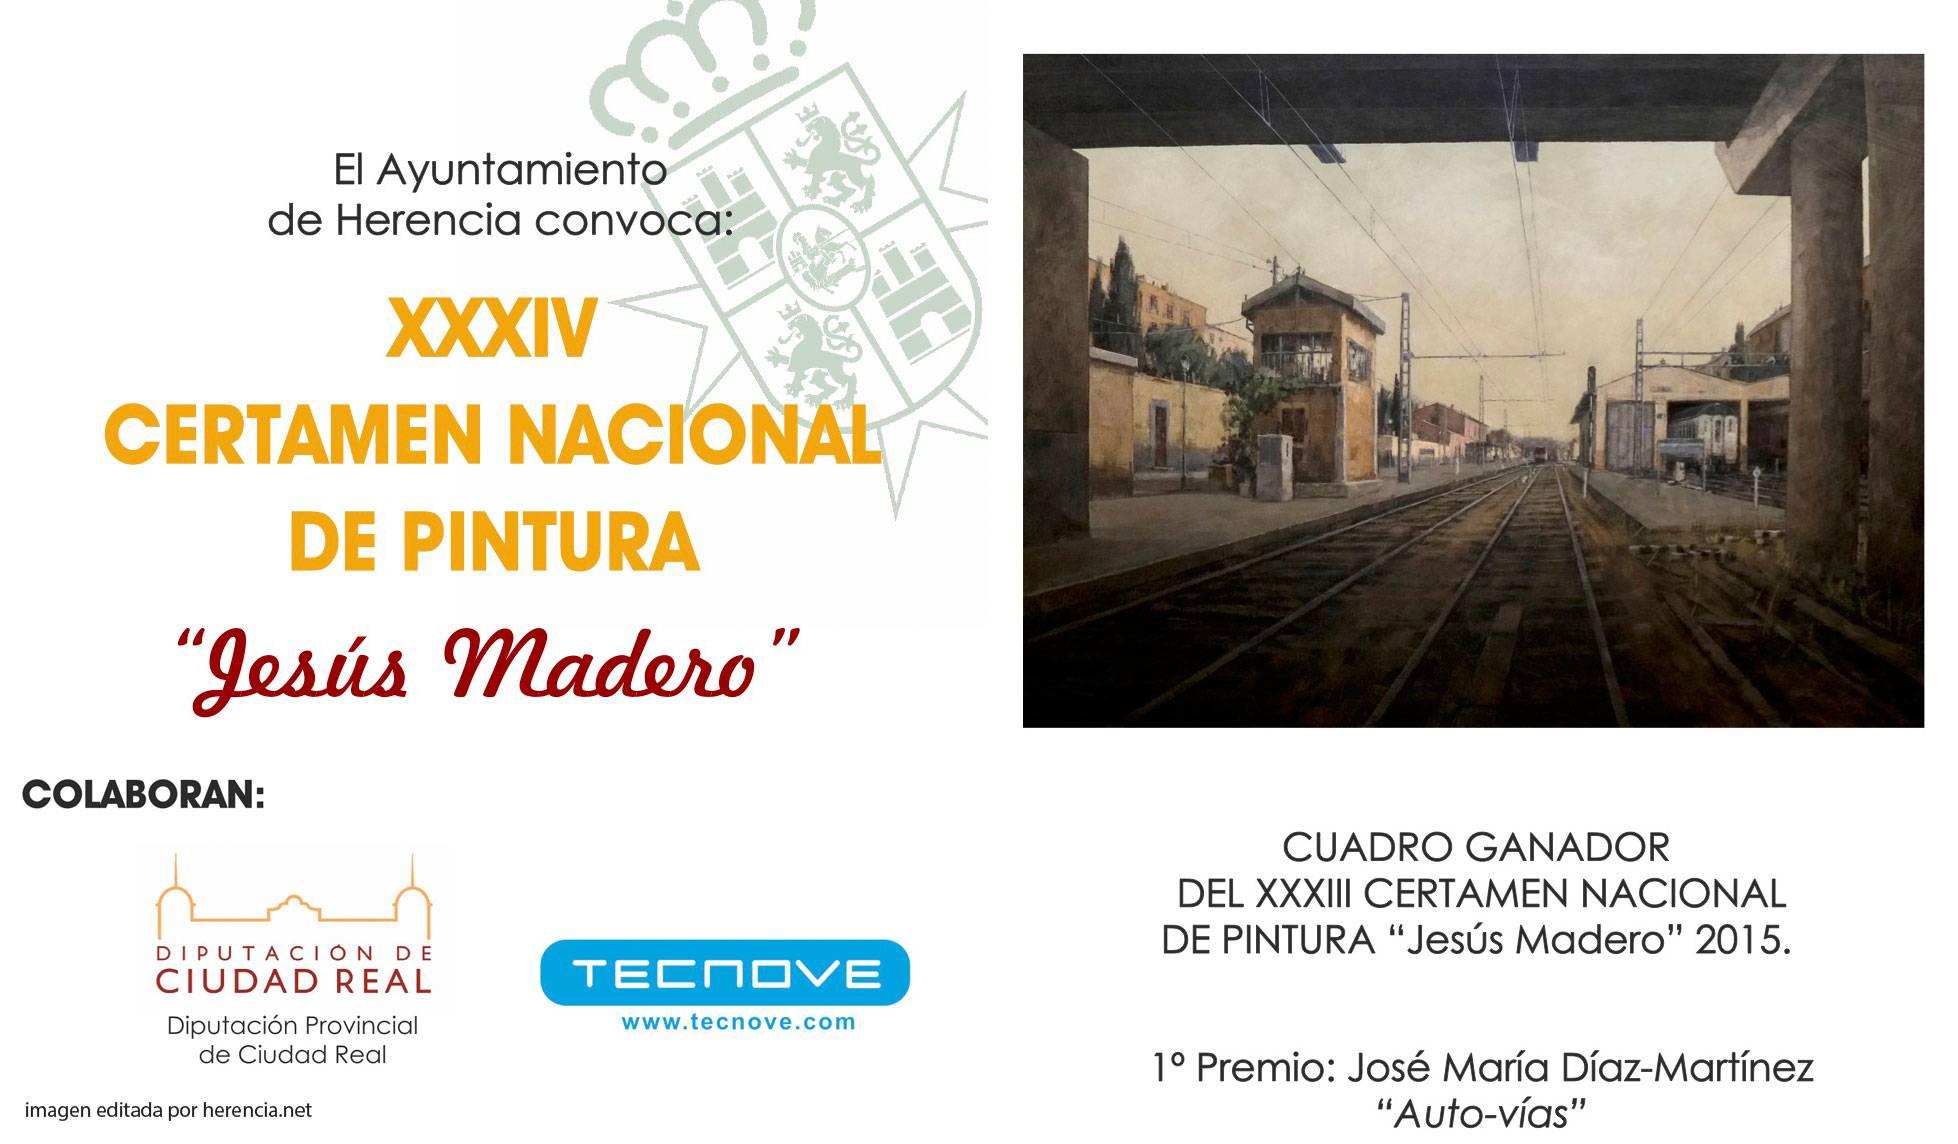 "XXXIV certamen nacional de pintura Jesus Madero - Participa en el XXXIV Certamen Nacional de Pintura ""Jesús Madero"""